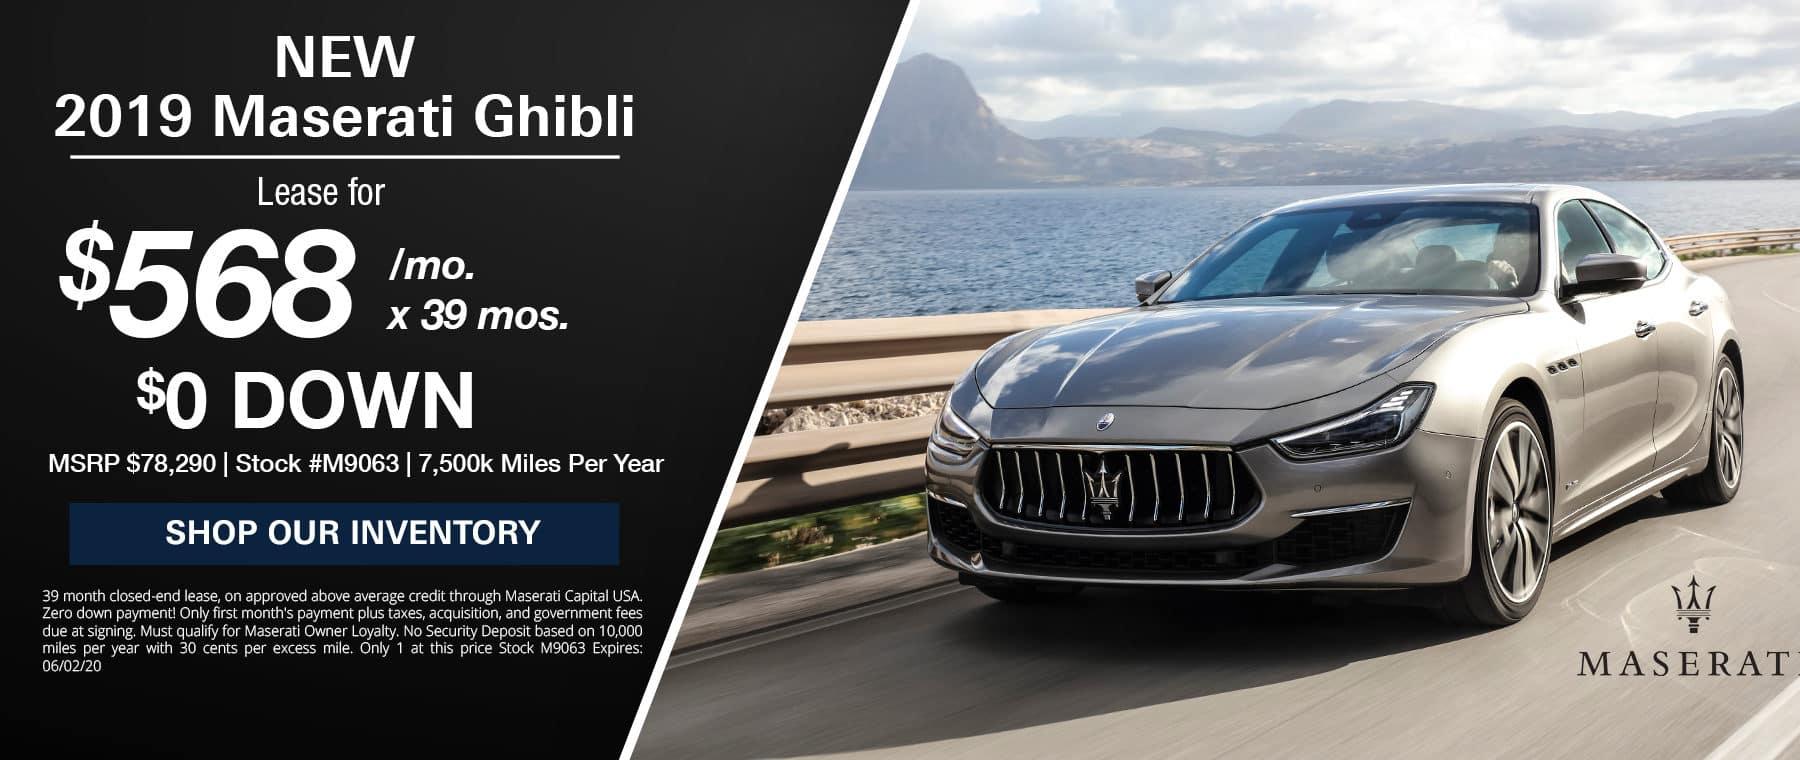 New Maserati Ghibli Lease Special